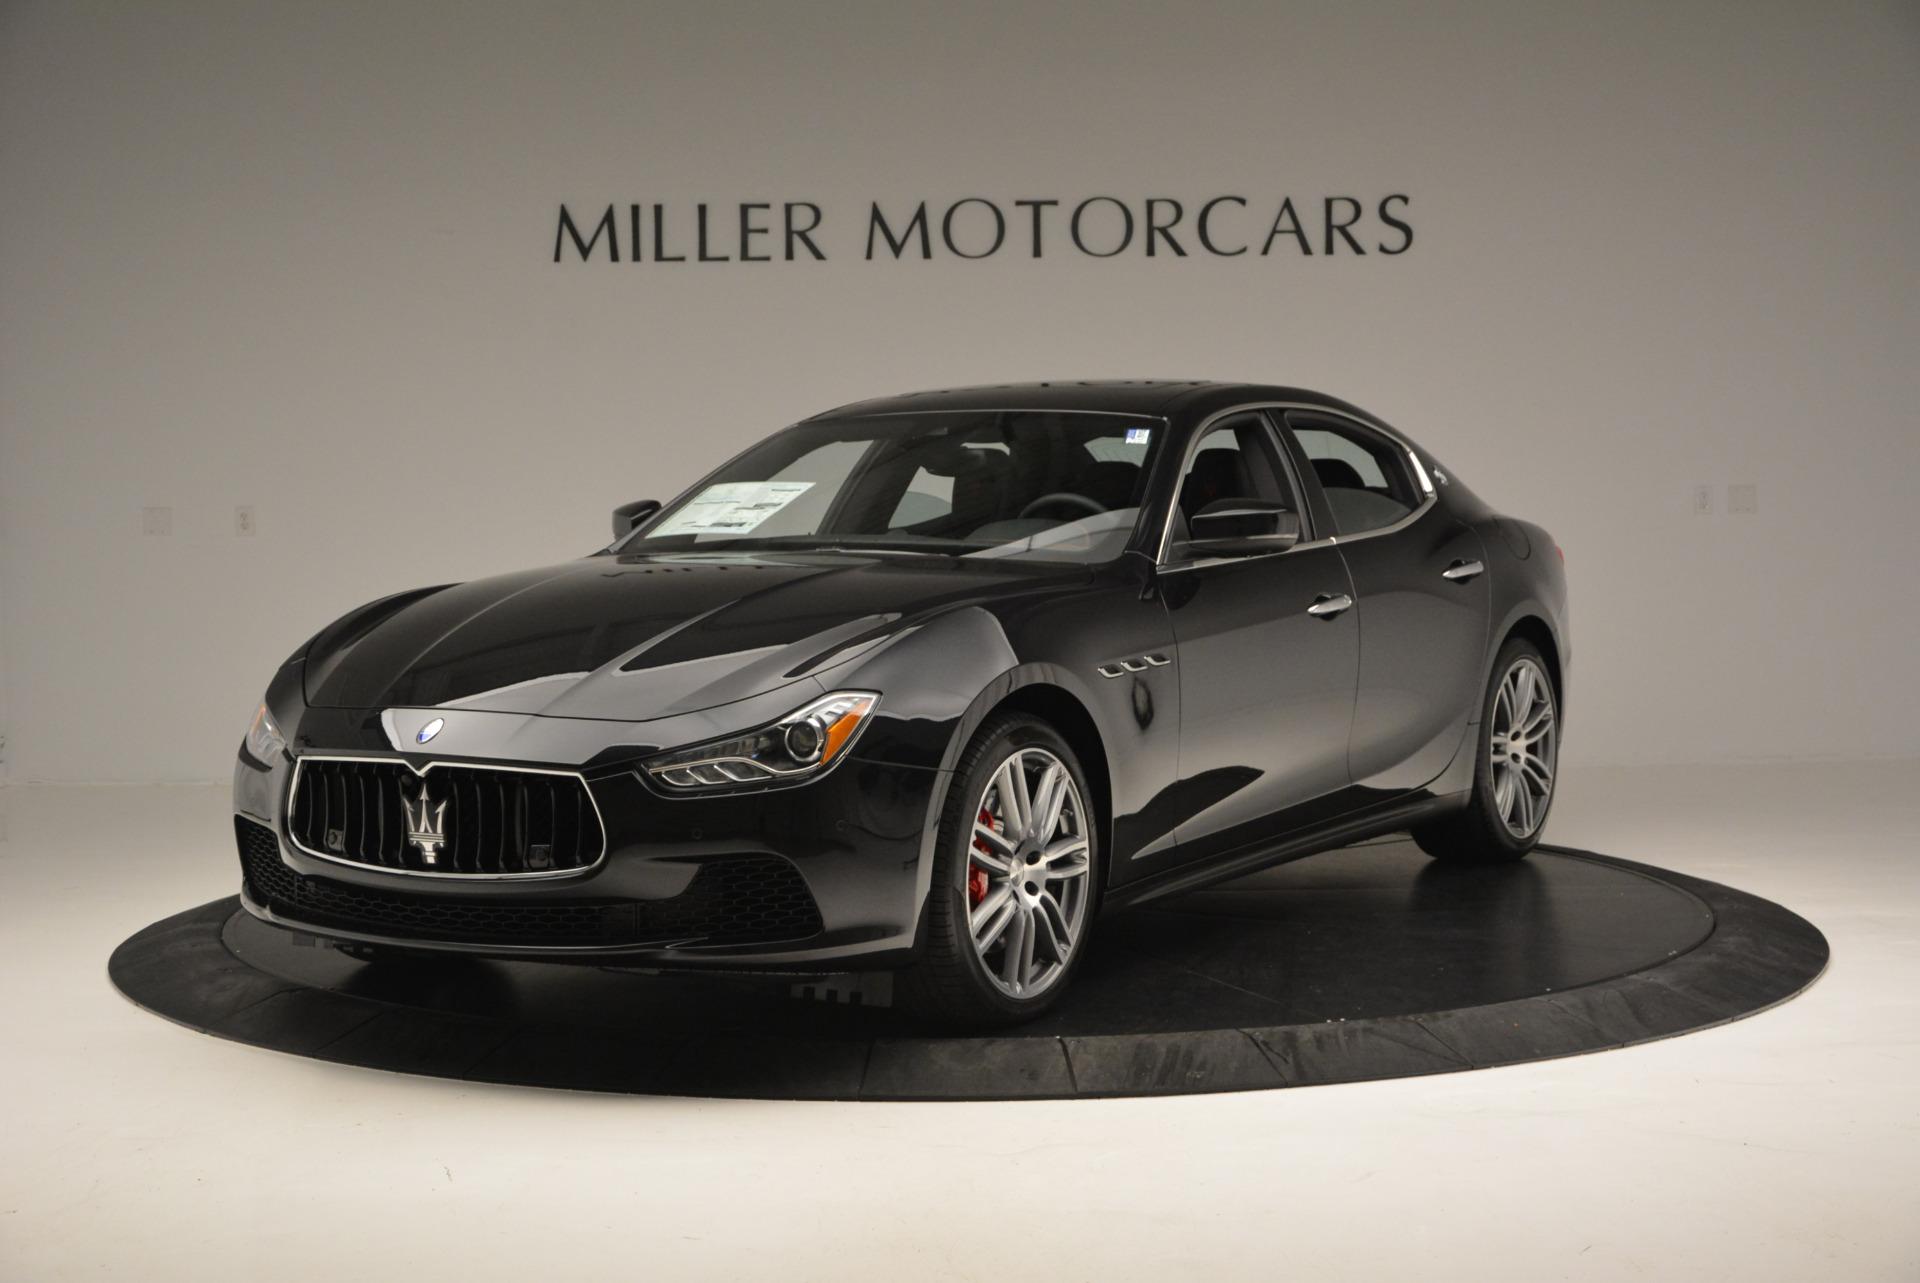 New 2017 Maserati Ghibli S Q4 For Sale In Greenwich, CT 630_main